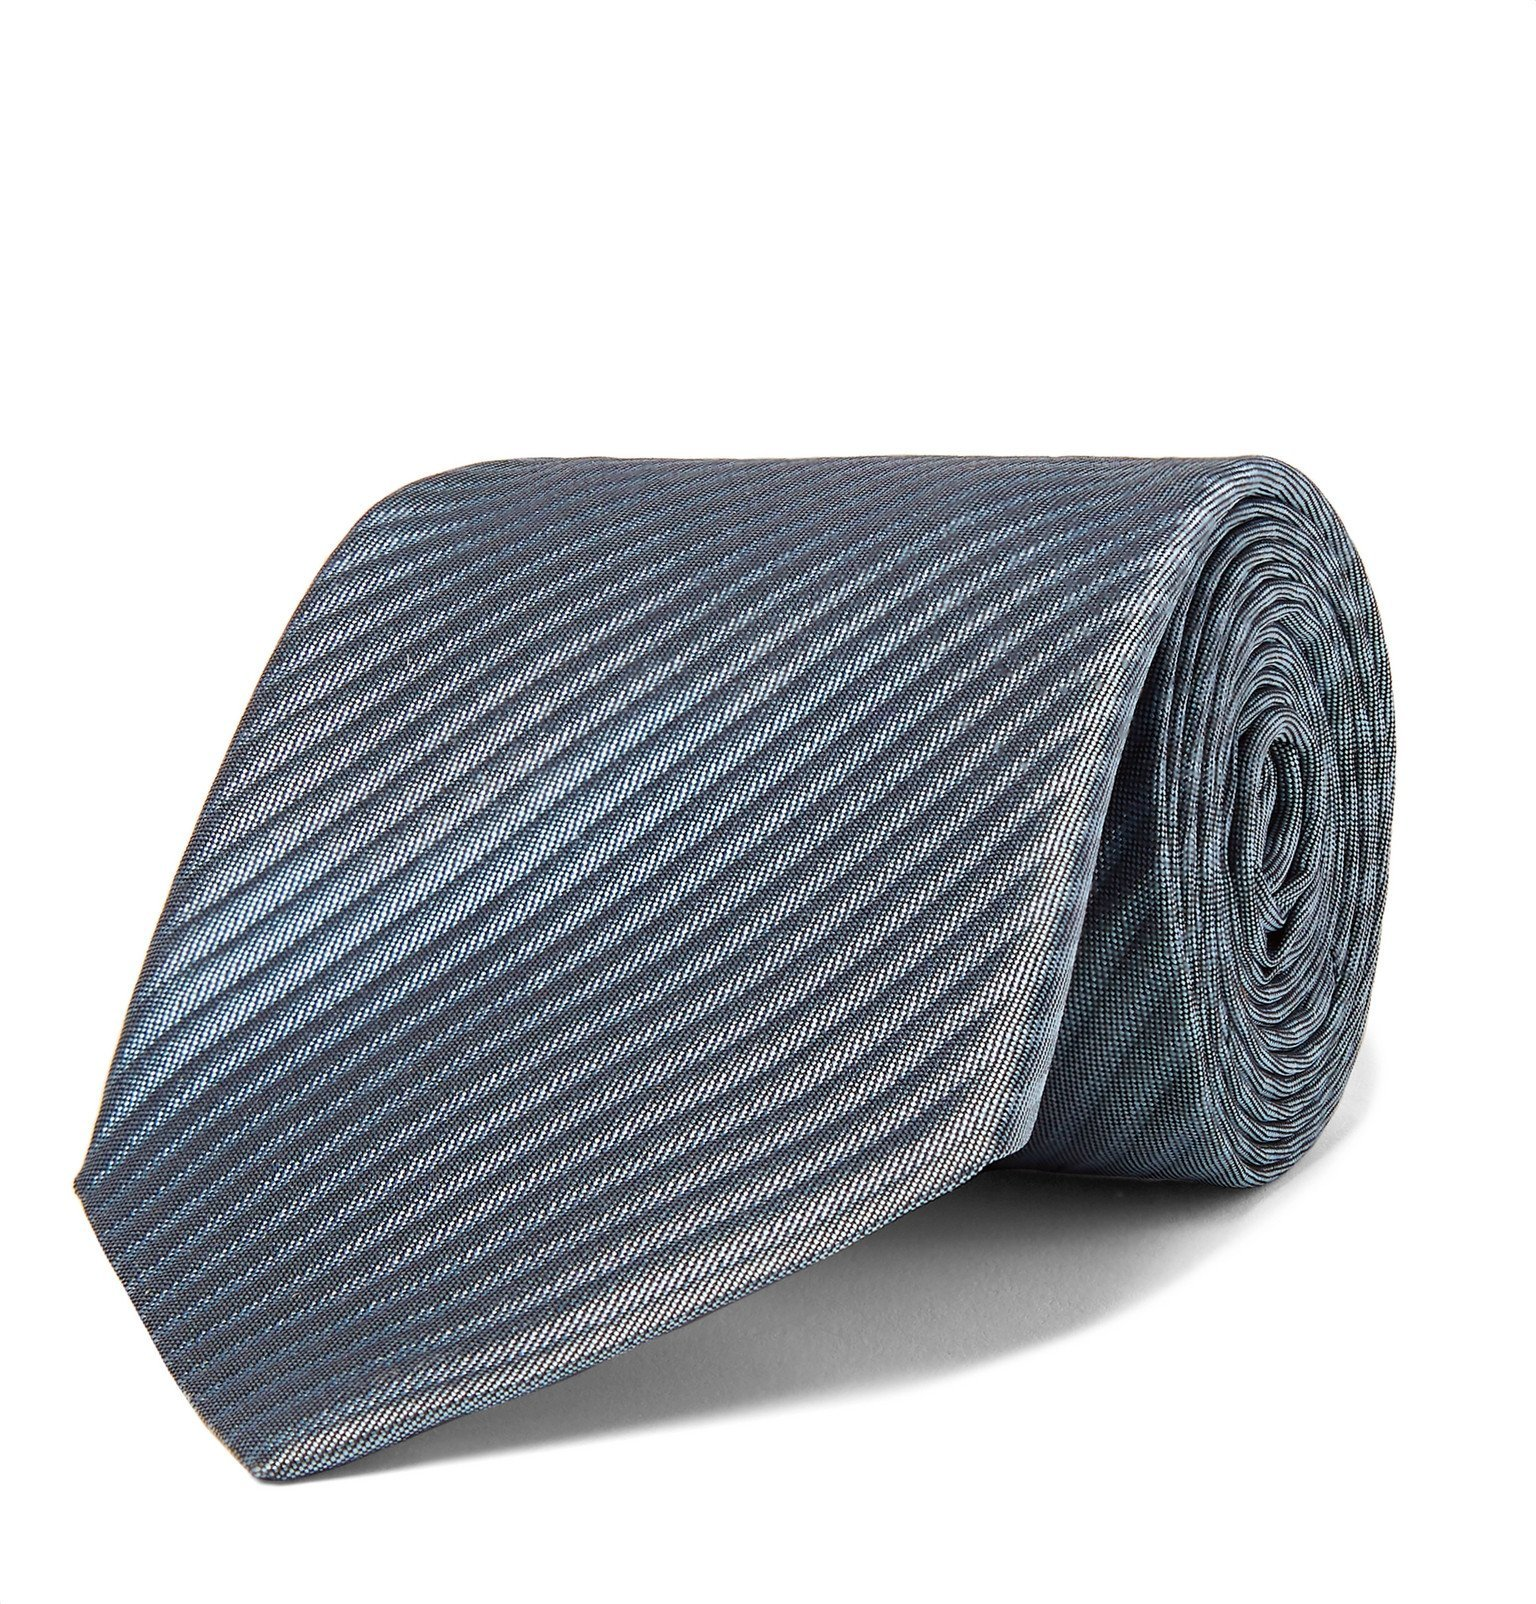 Giorgio Armani - 8cm Striped Silk-Jacquard Tie - Blue